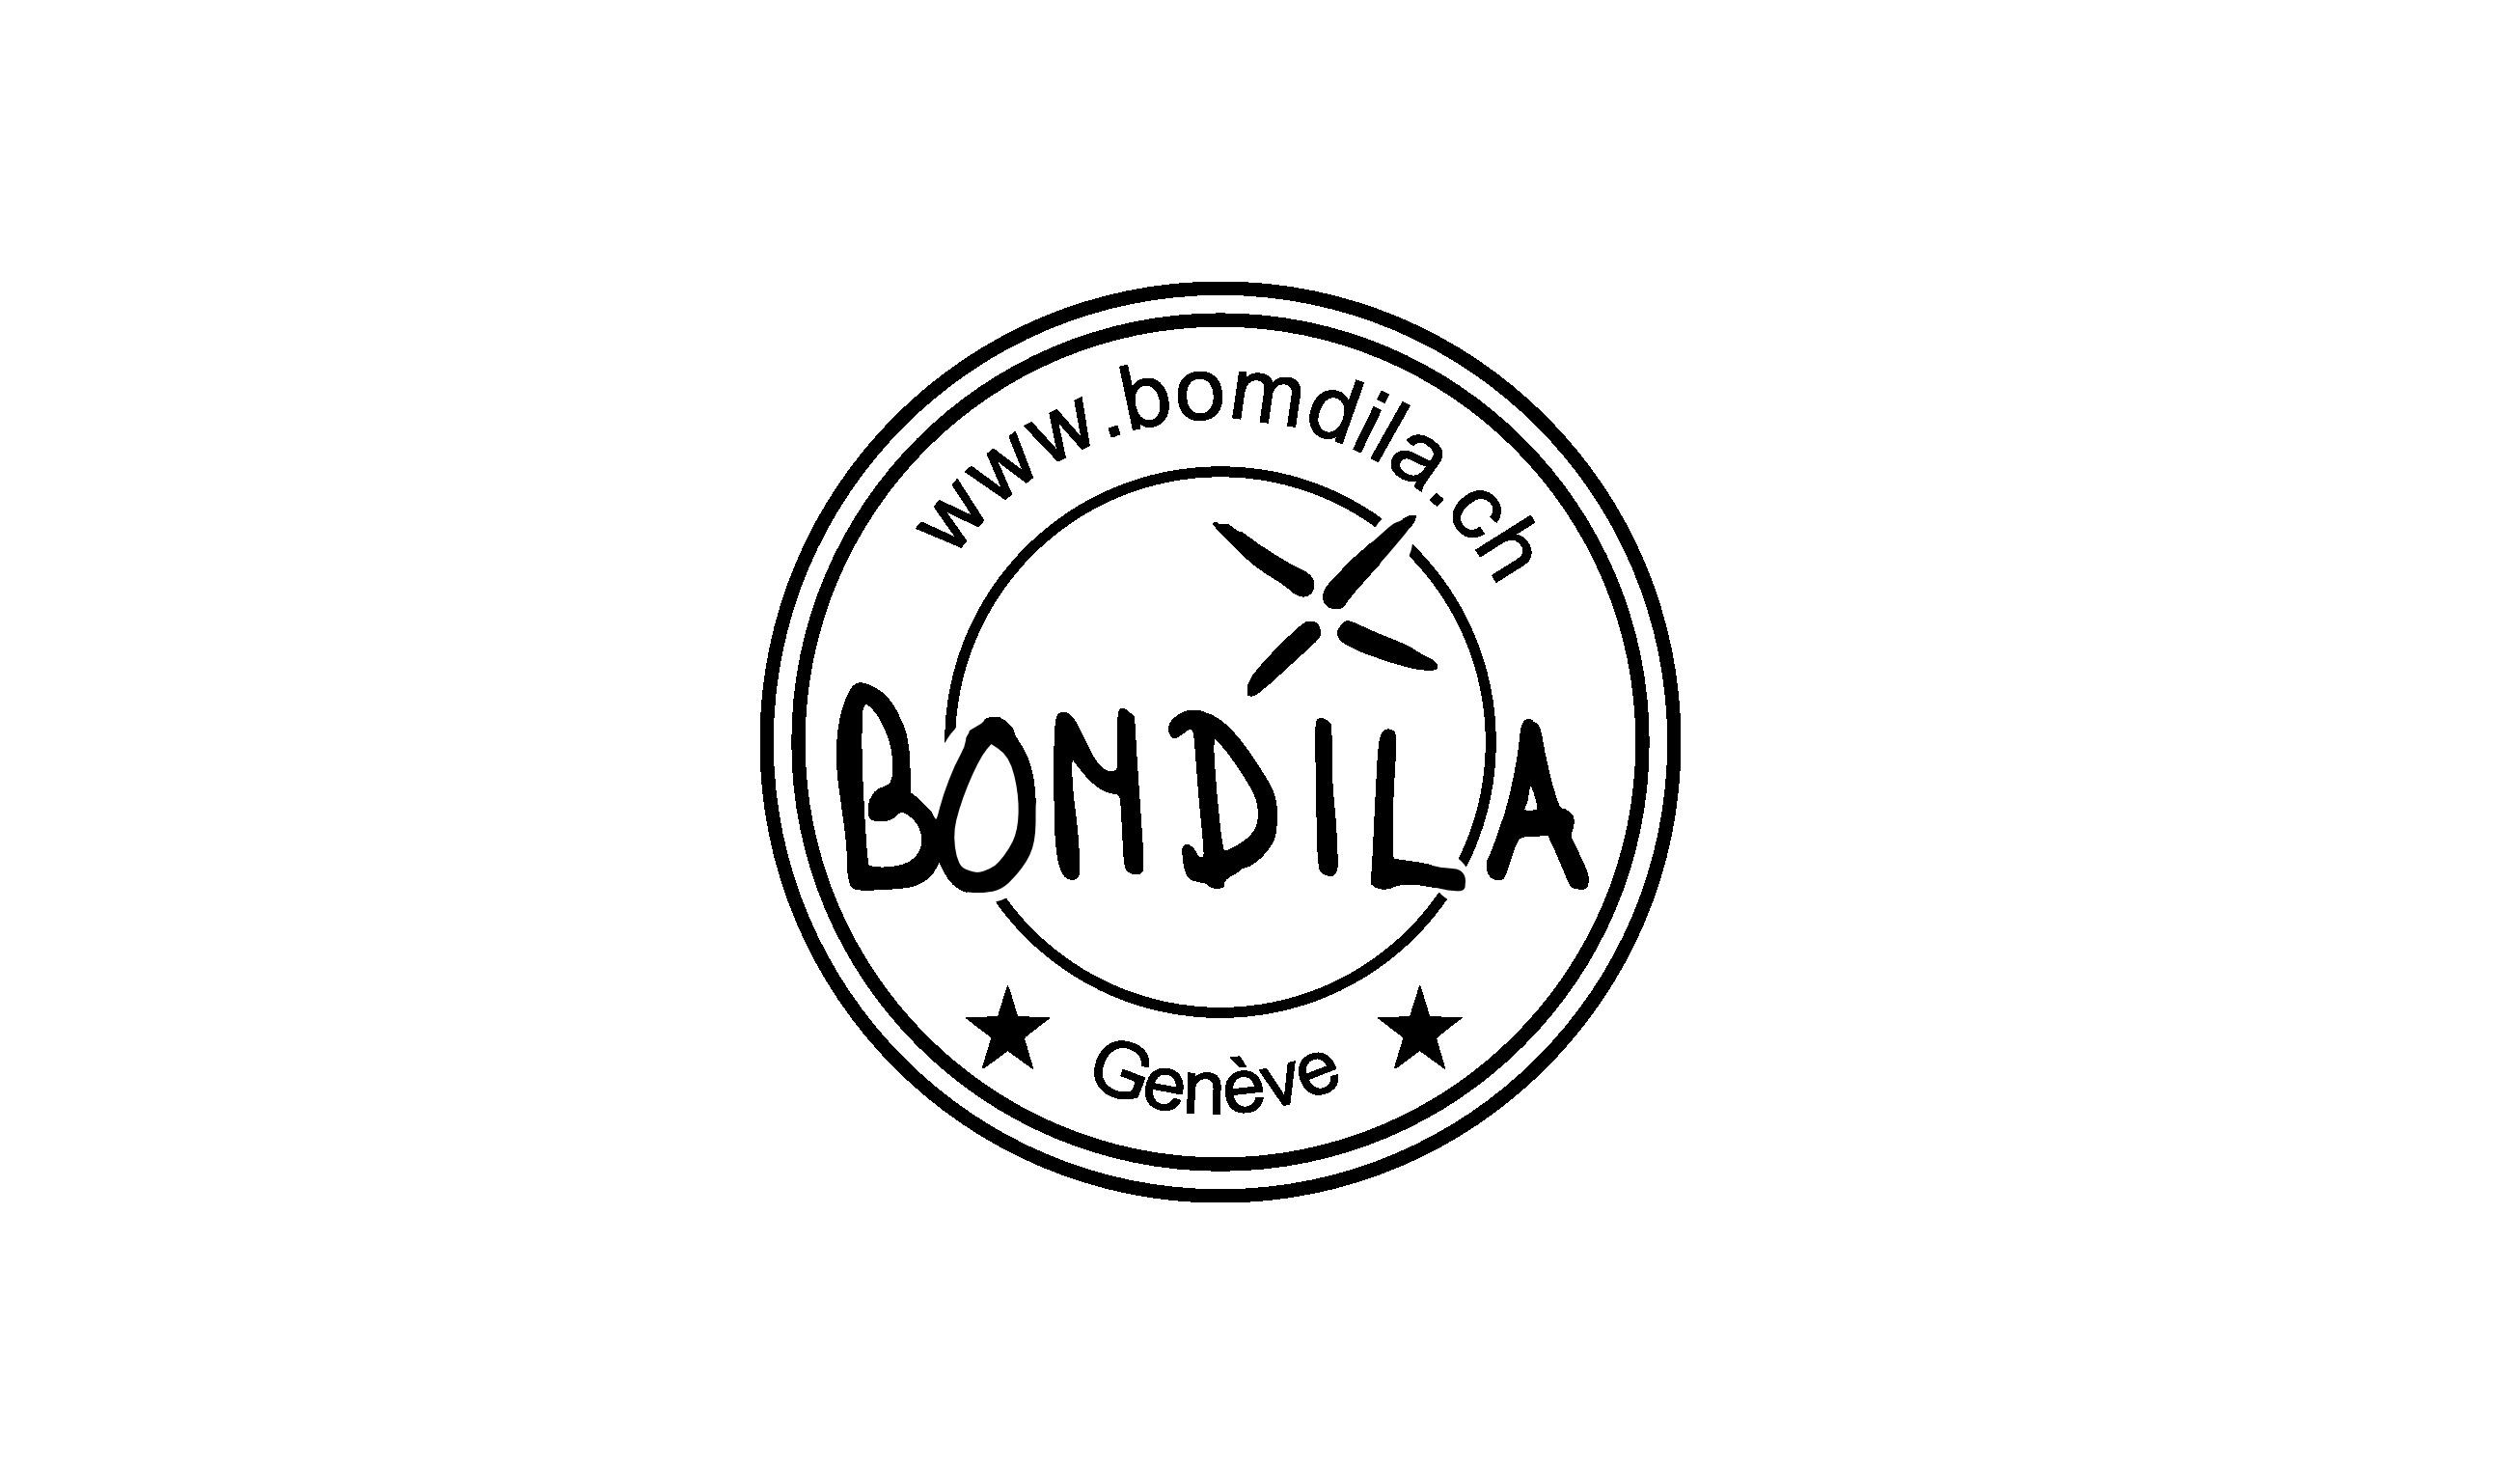 Bomdila logo